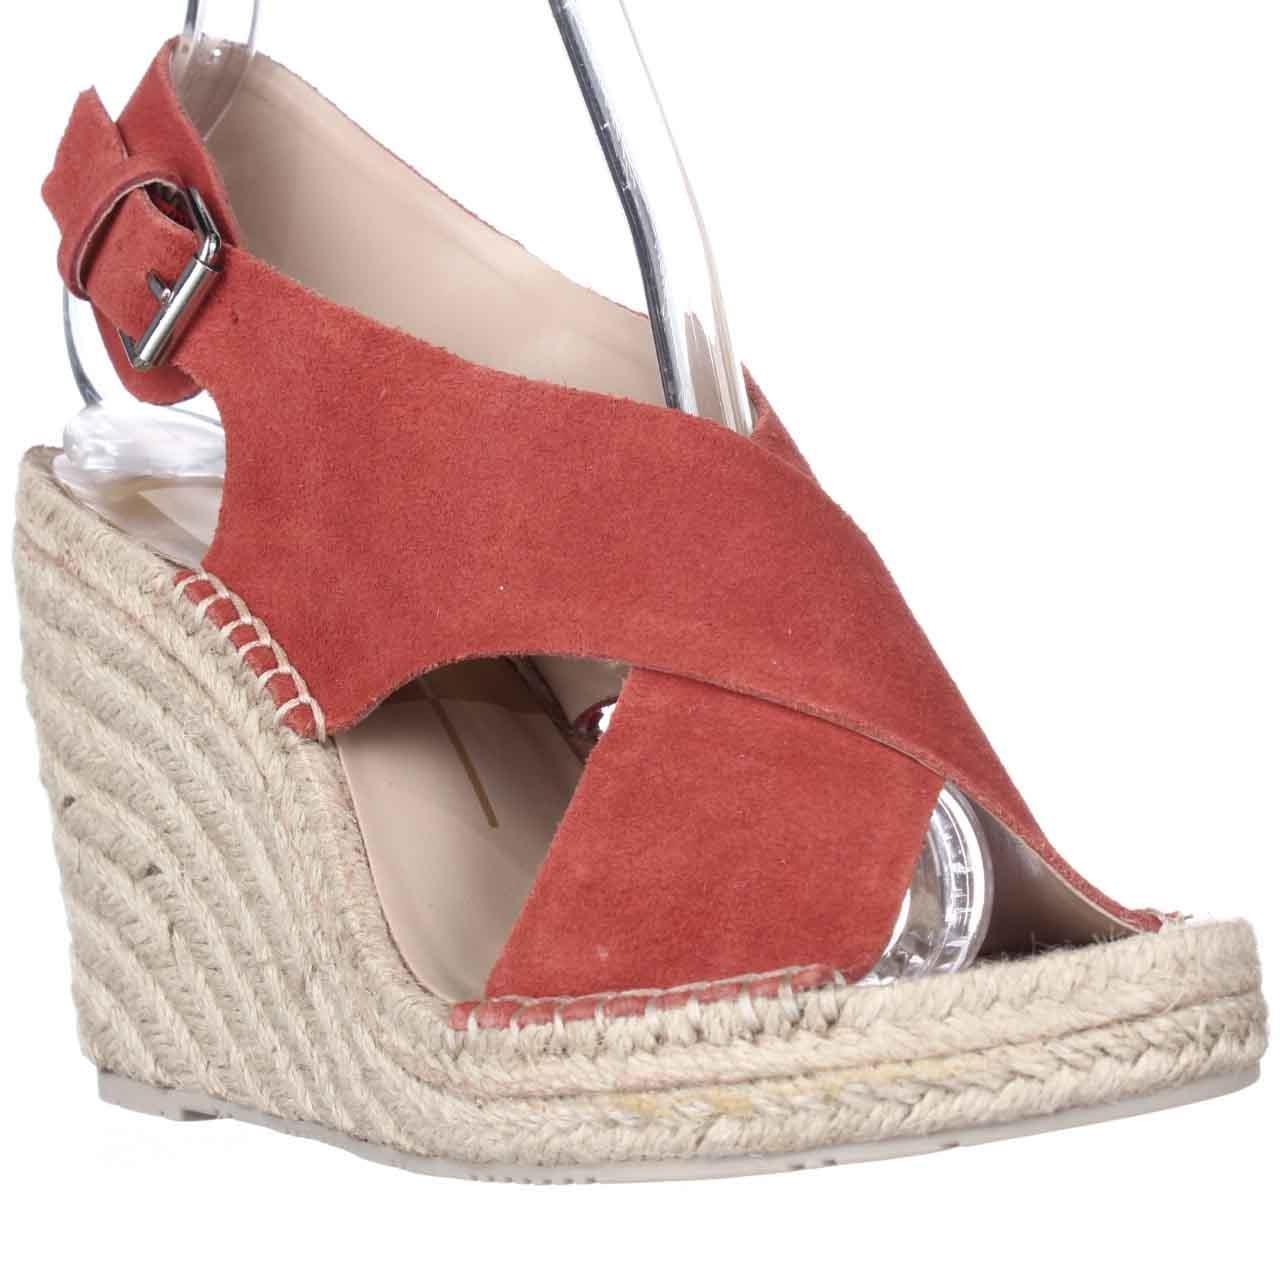 Dv Dolce Vita Tulle Espadrille Wedge Sandals: Dolce Vita Dv By Sovay Espadrille Wedge Platform Sandals